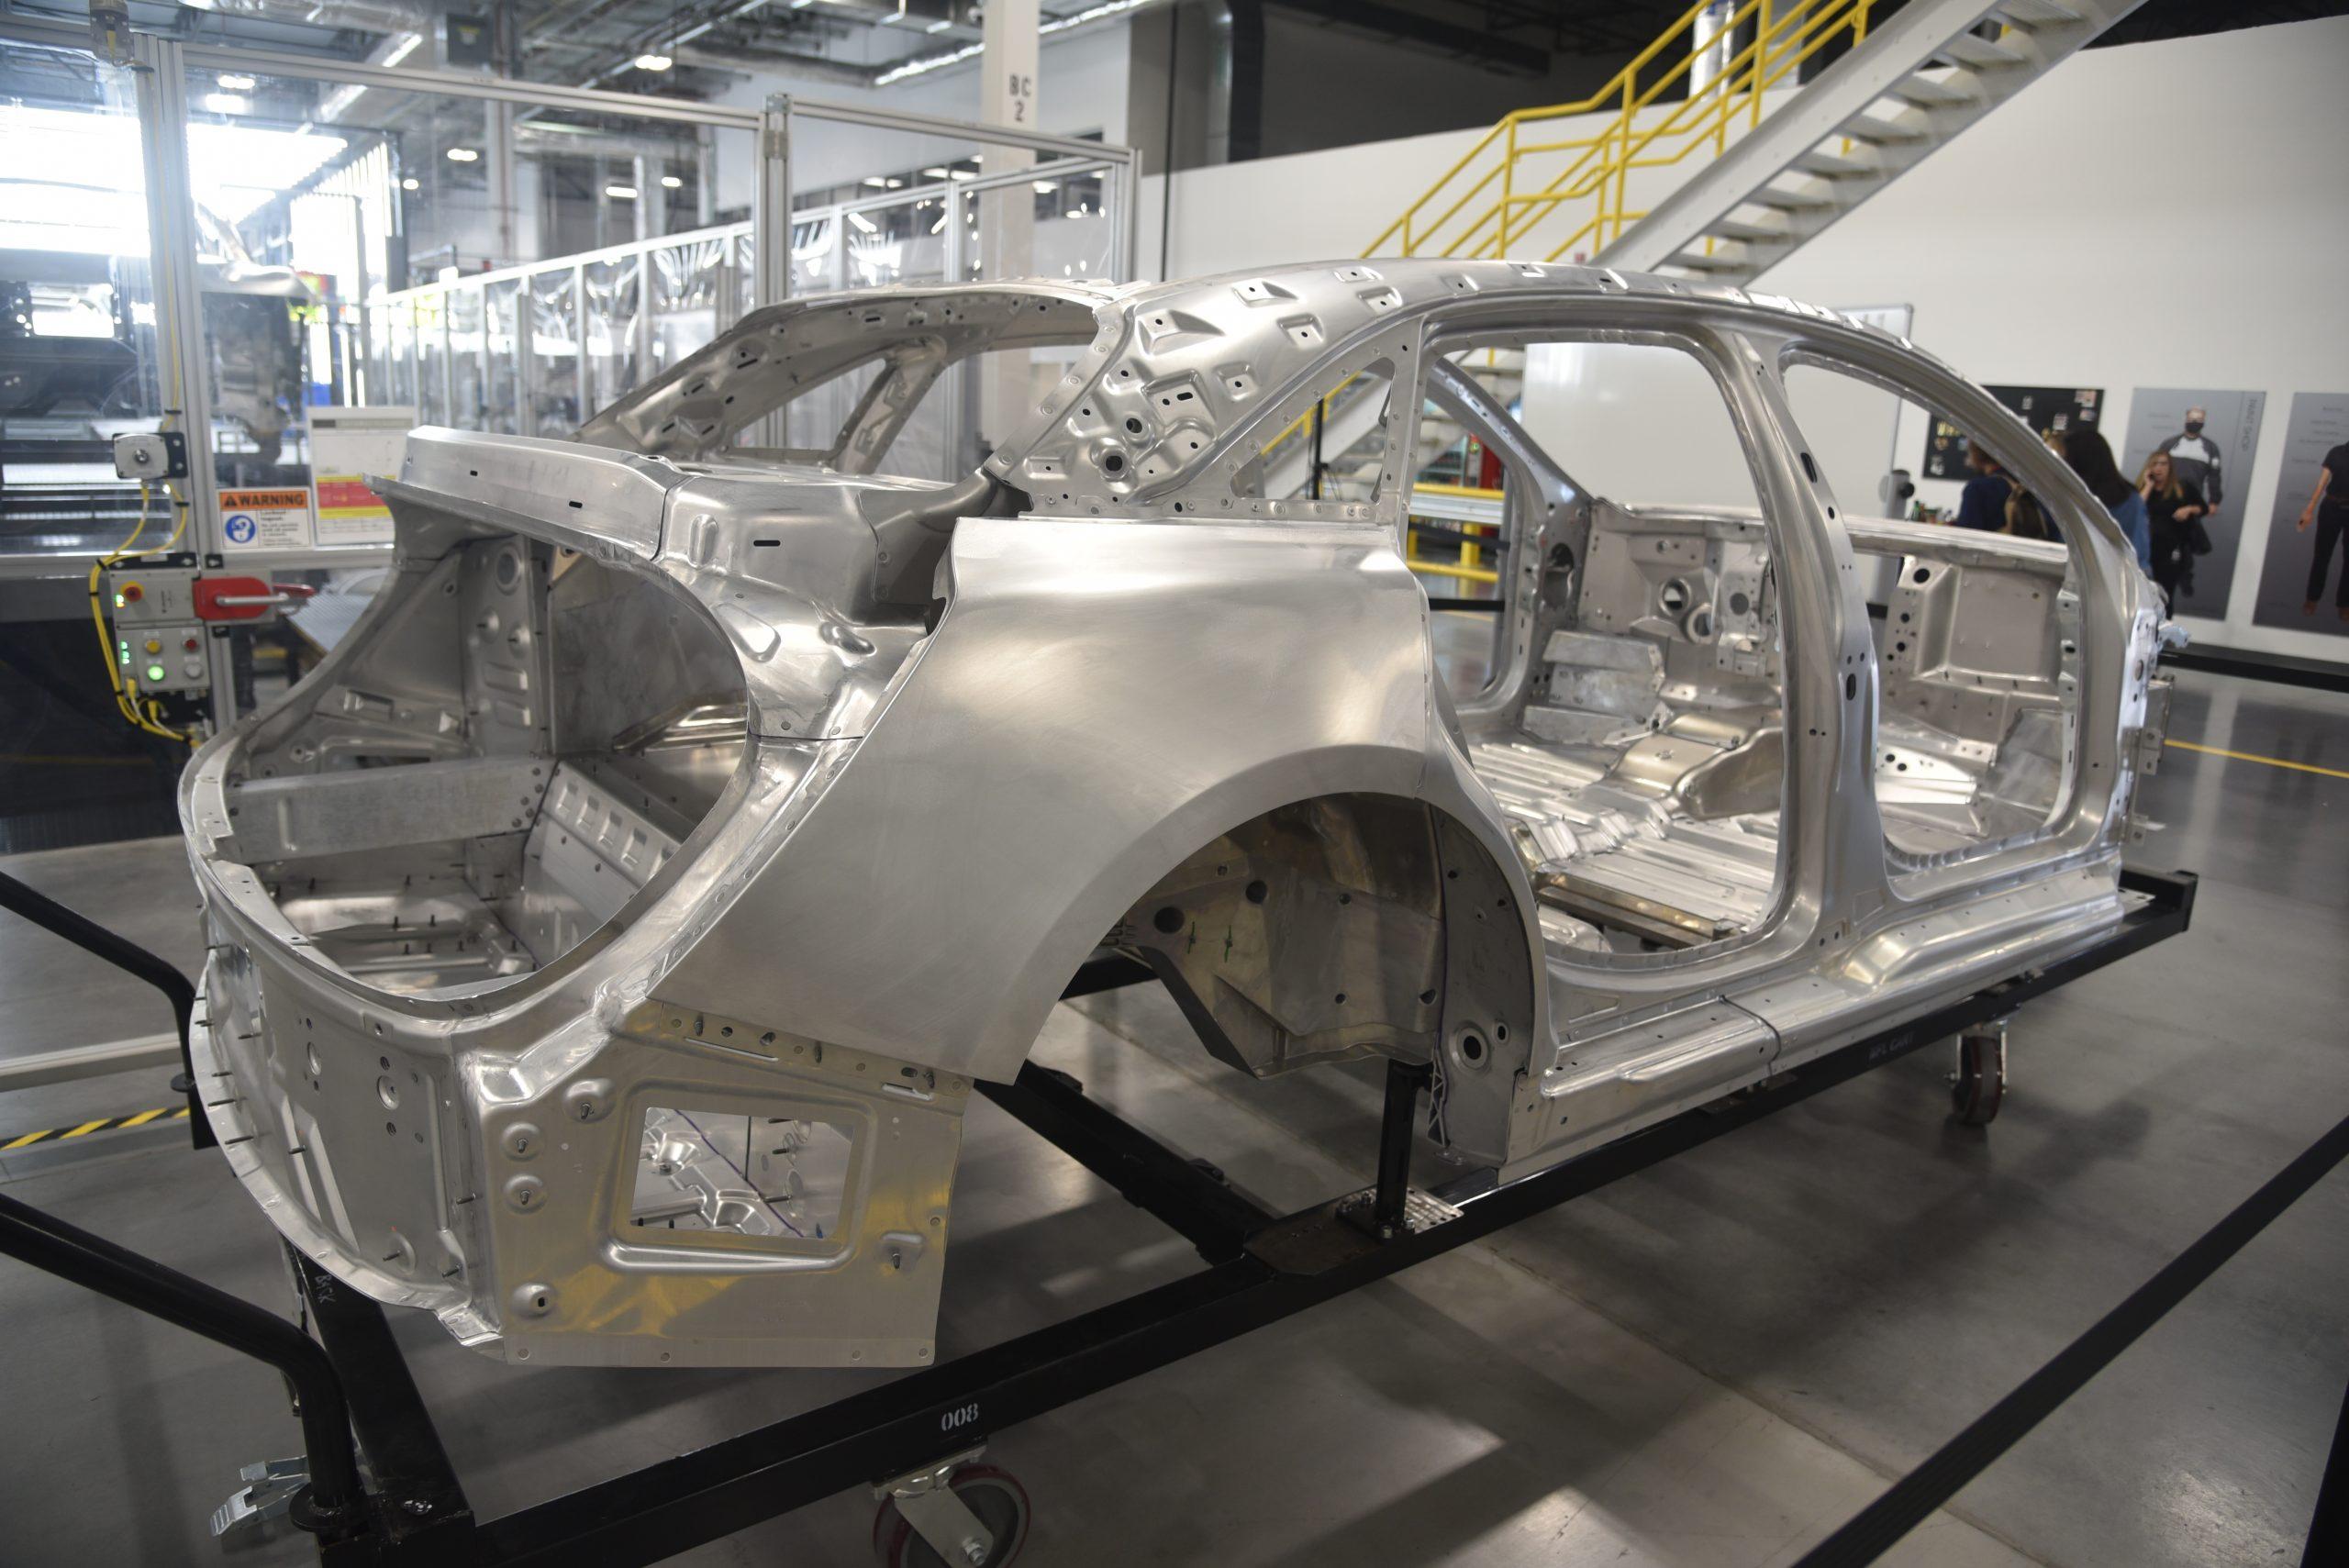 Lucid Air production line body rear quarter